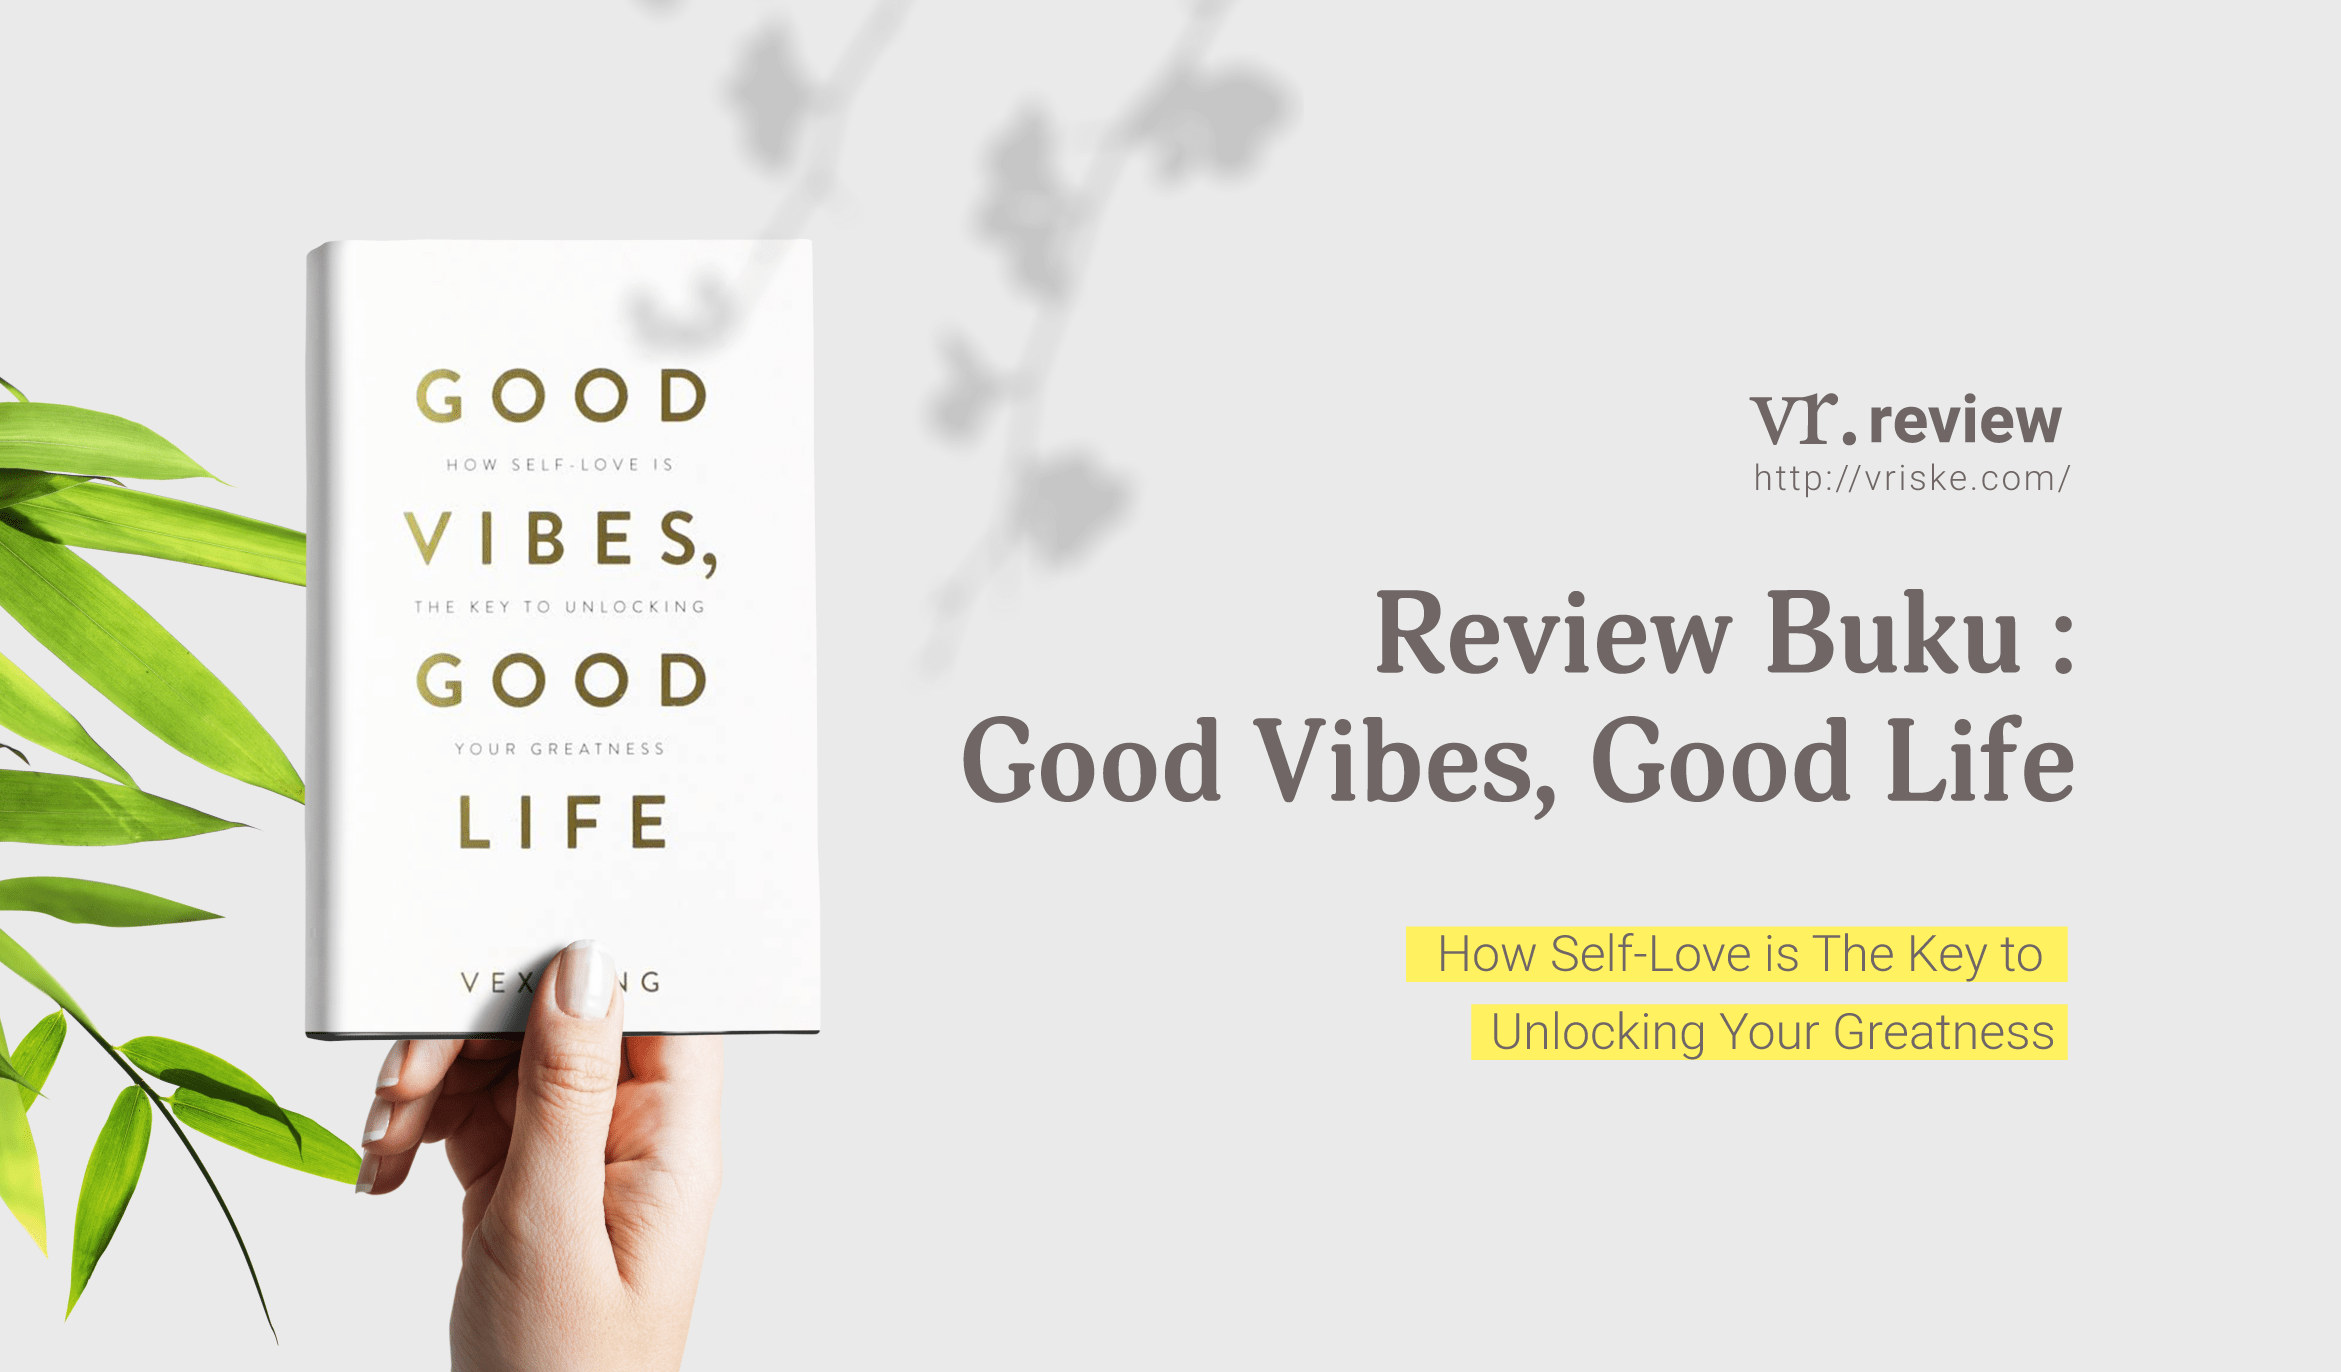 Good Vibes, Good Life by Vex King (Review Buku)